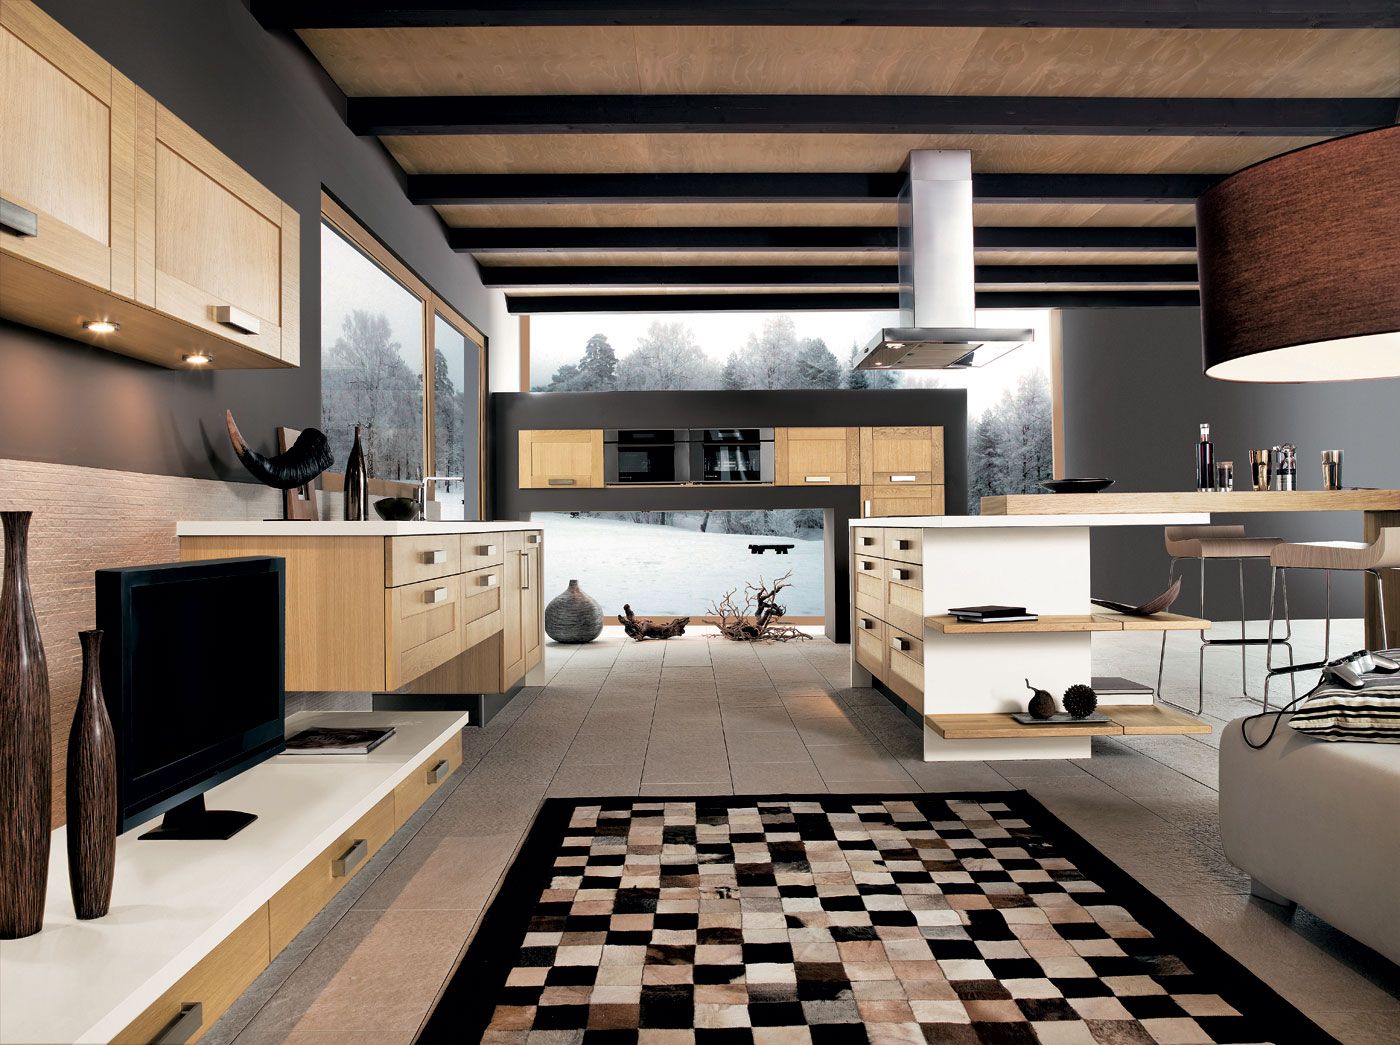 cuisine tana ch ne nature perene lyon. Black Bedroom Furniture Sets. Home Design Ideas